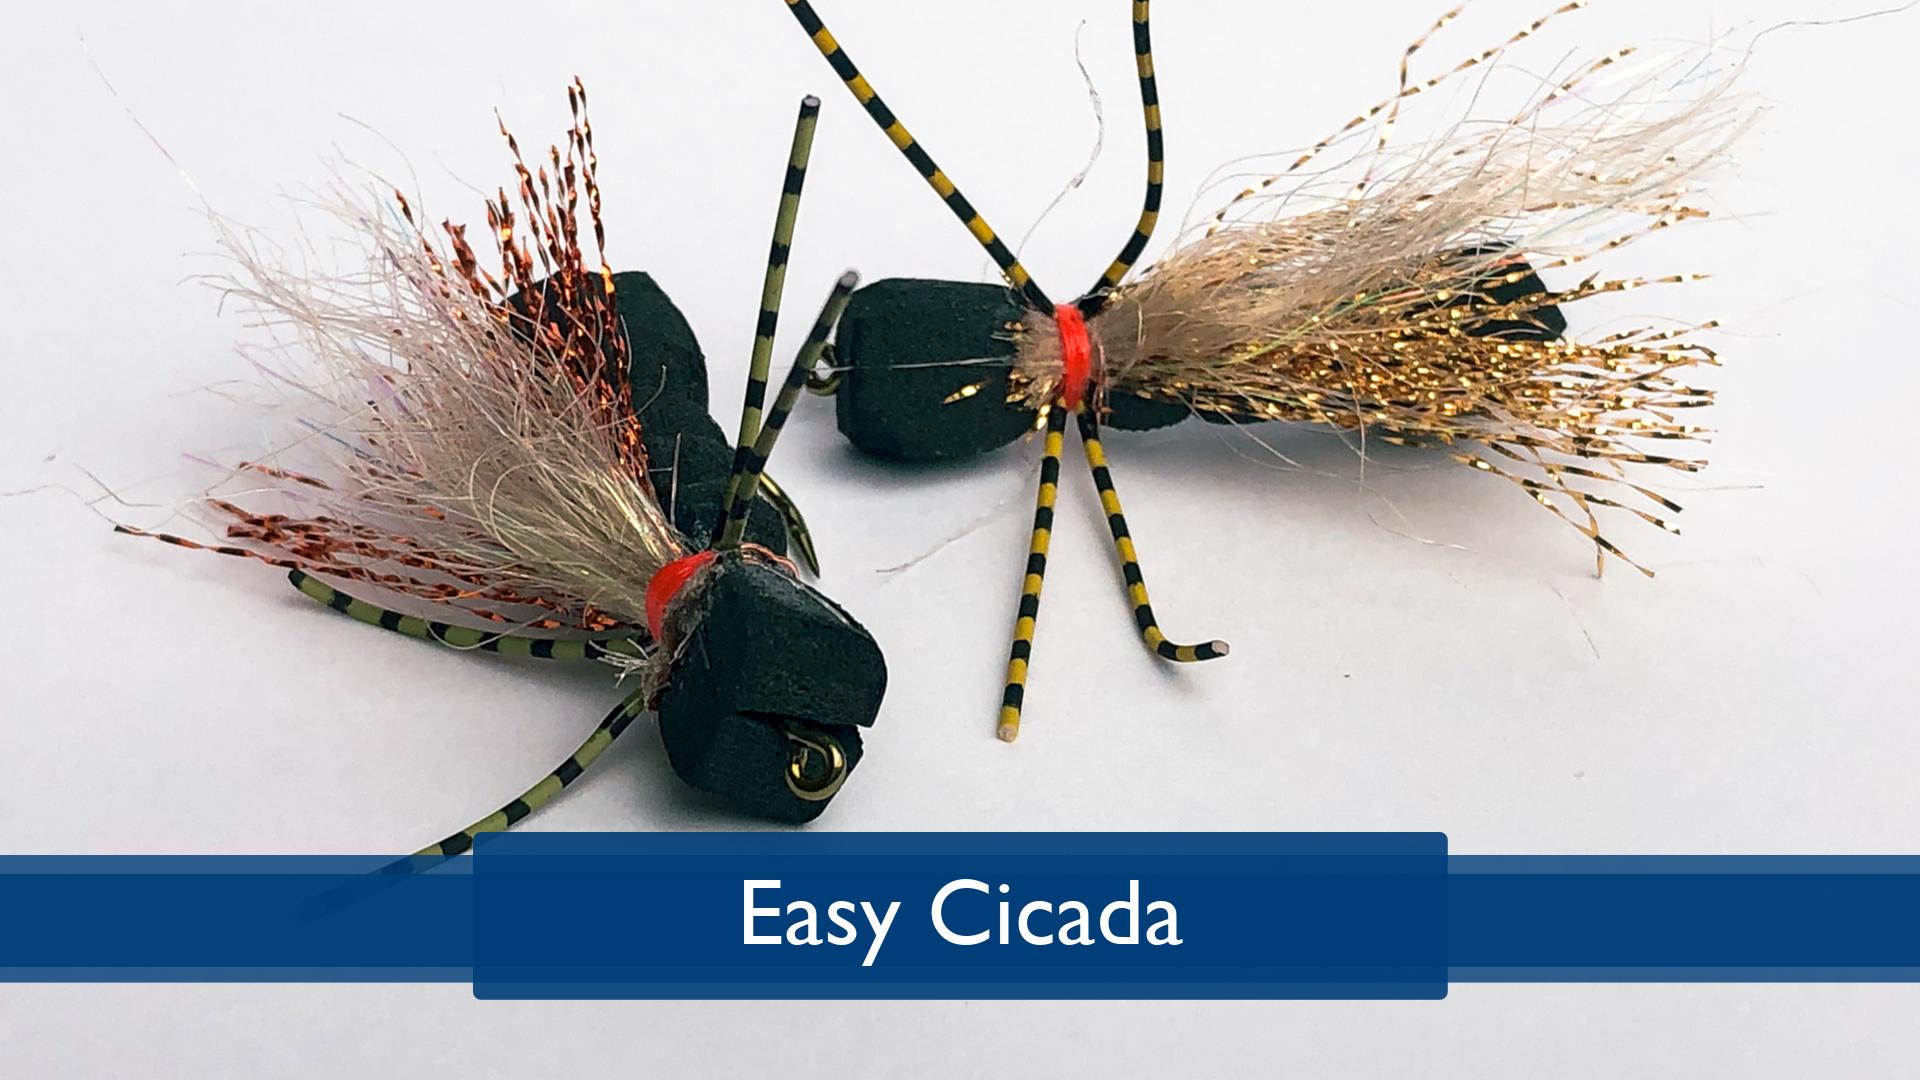 Tying the Easy Cicada with Rich DiStanislao